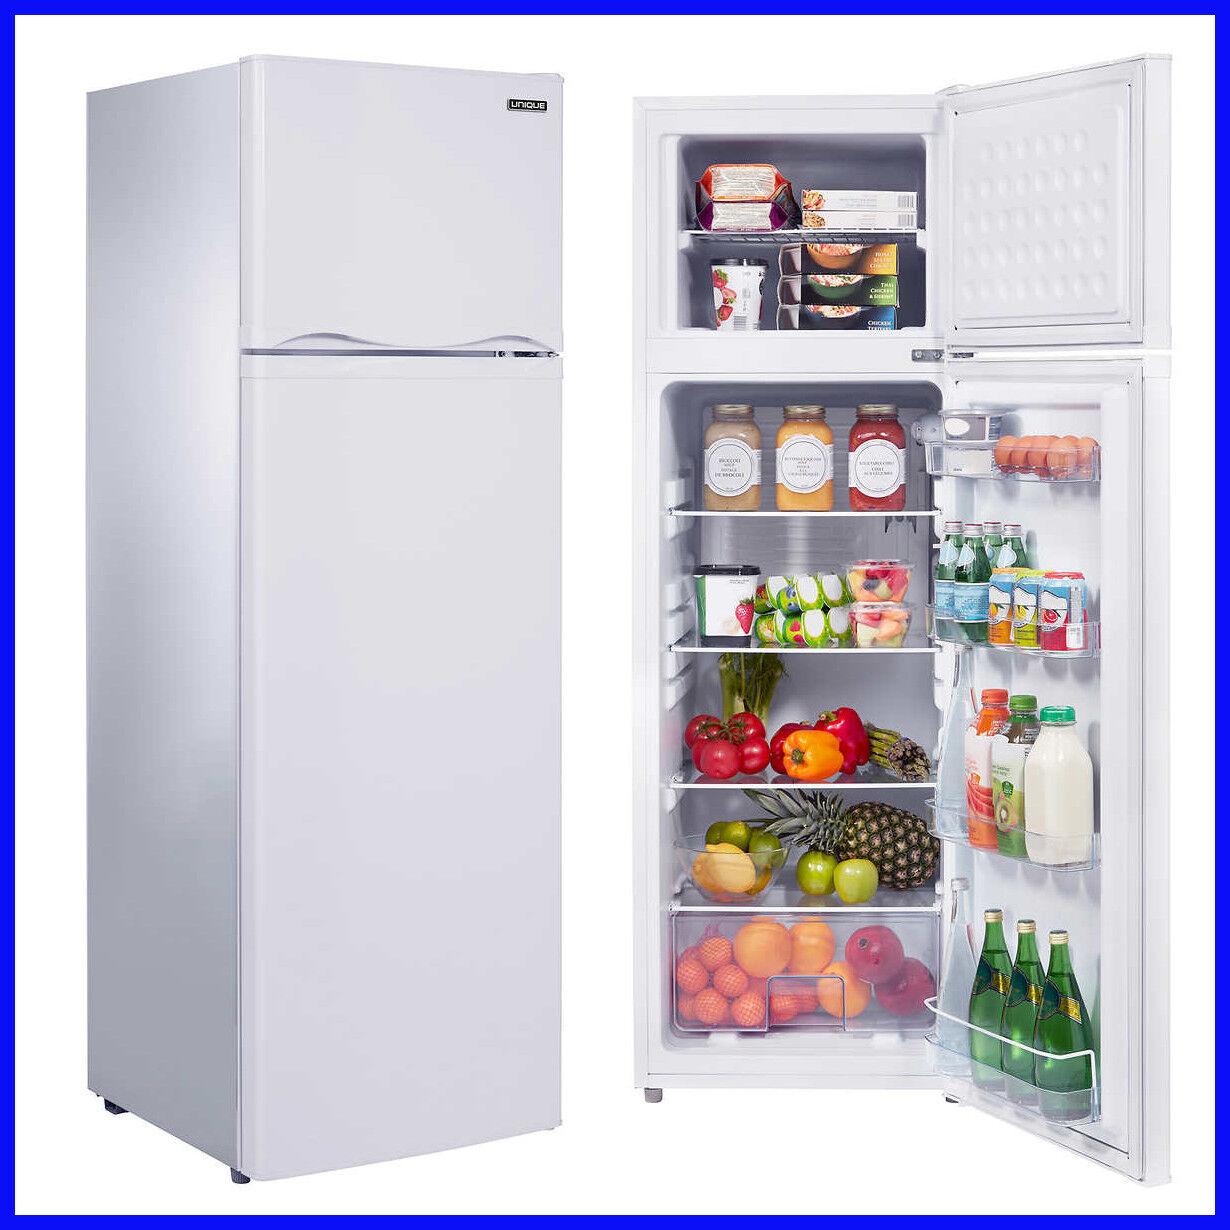 Unique 9.0 CuFt Solar Powered DC Refrigerator - UGP-260L W